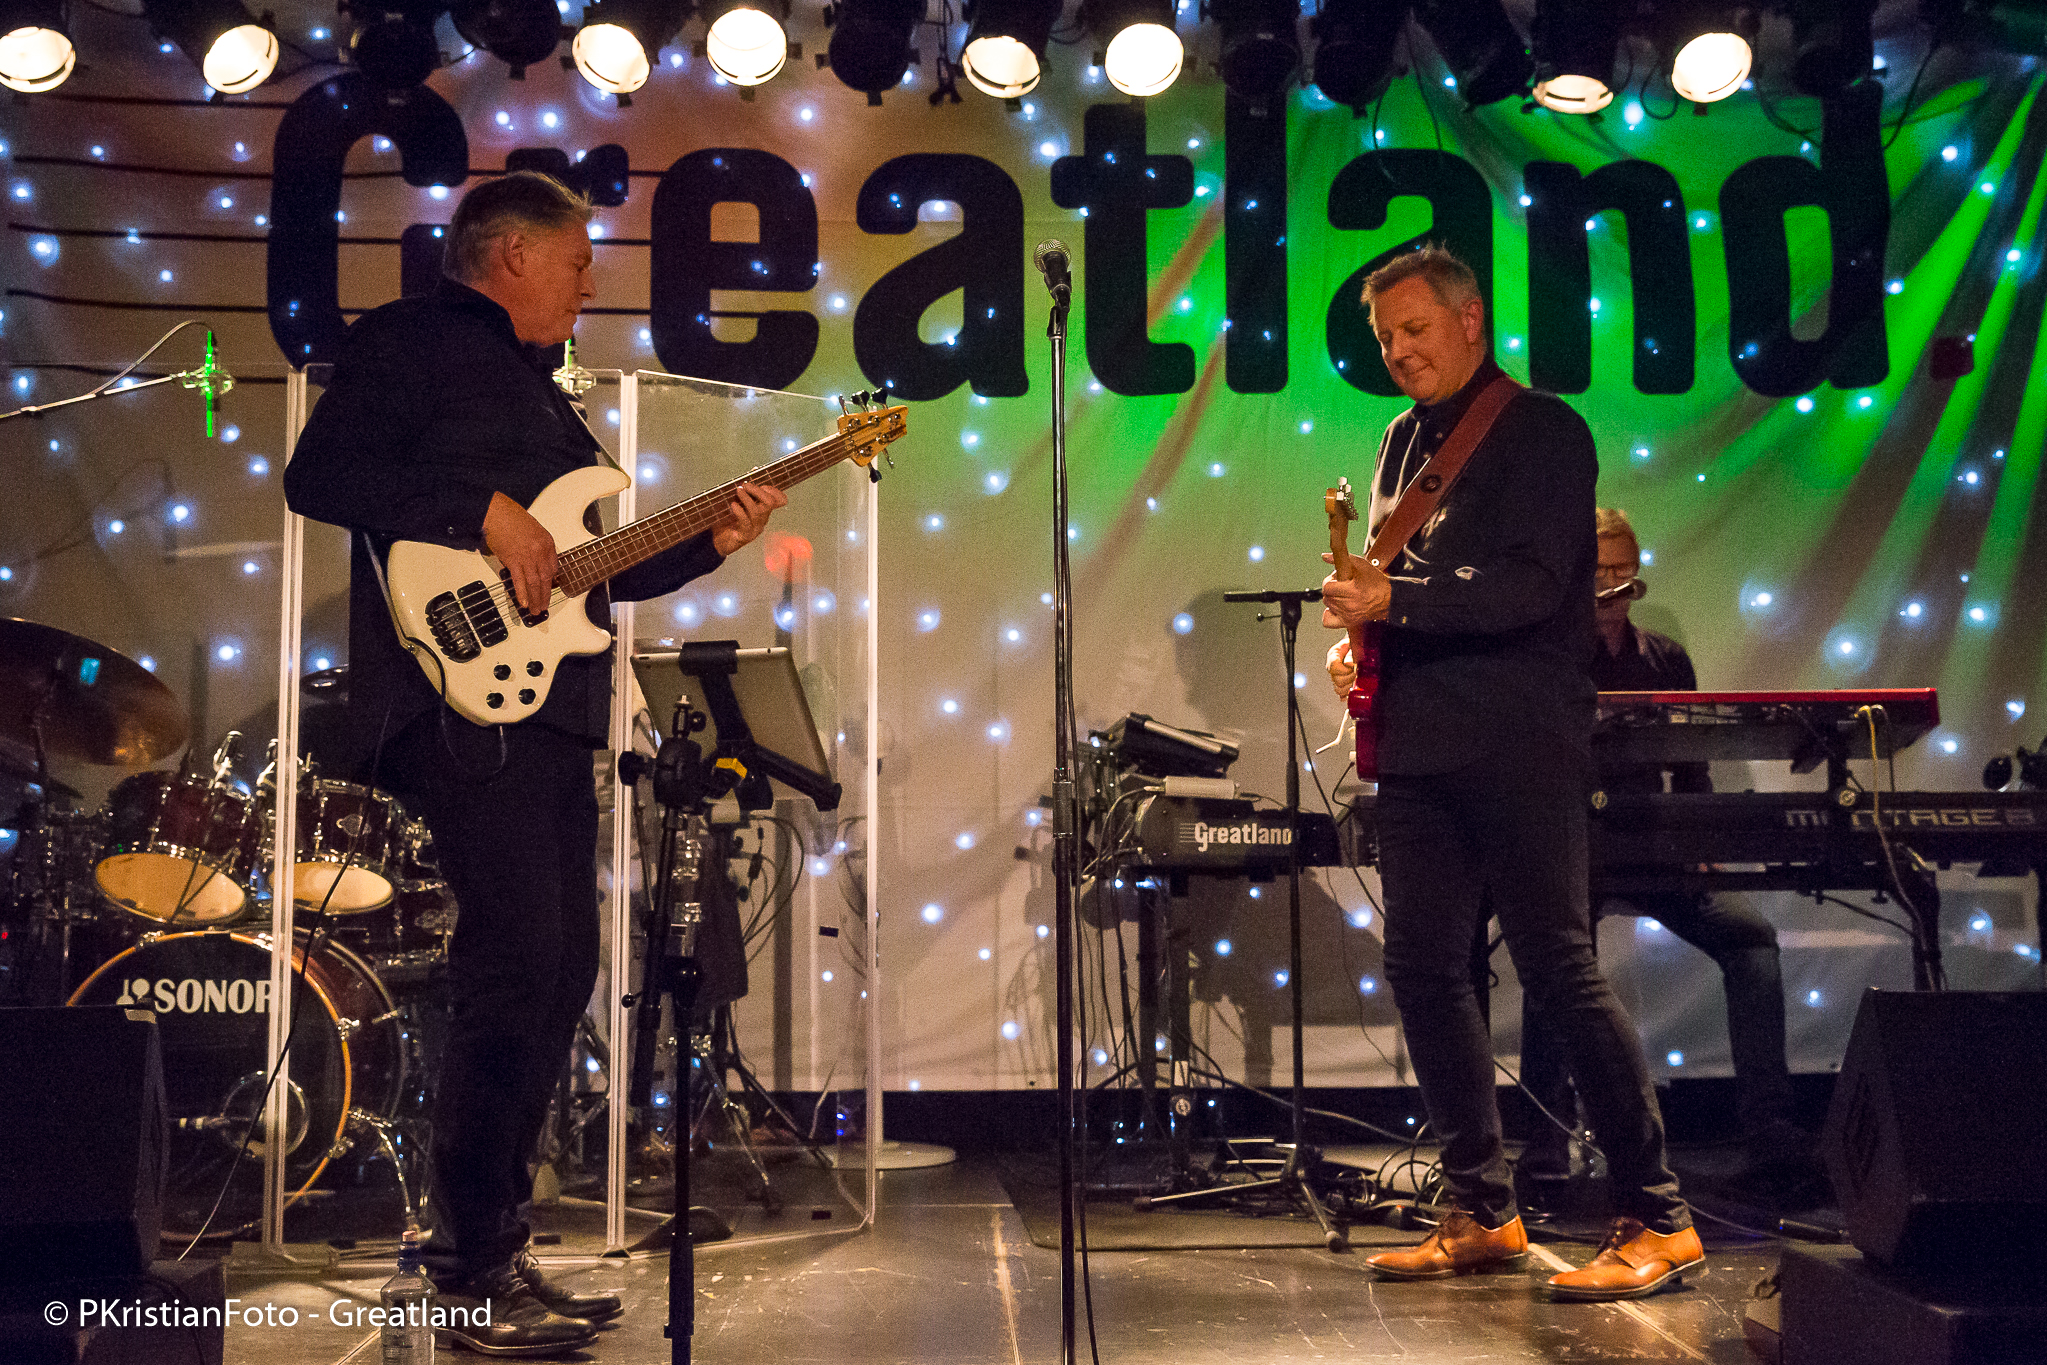 2016.12.03 Greatland - Gamlebyen Kulturhus - 157